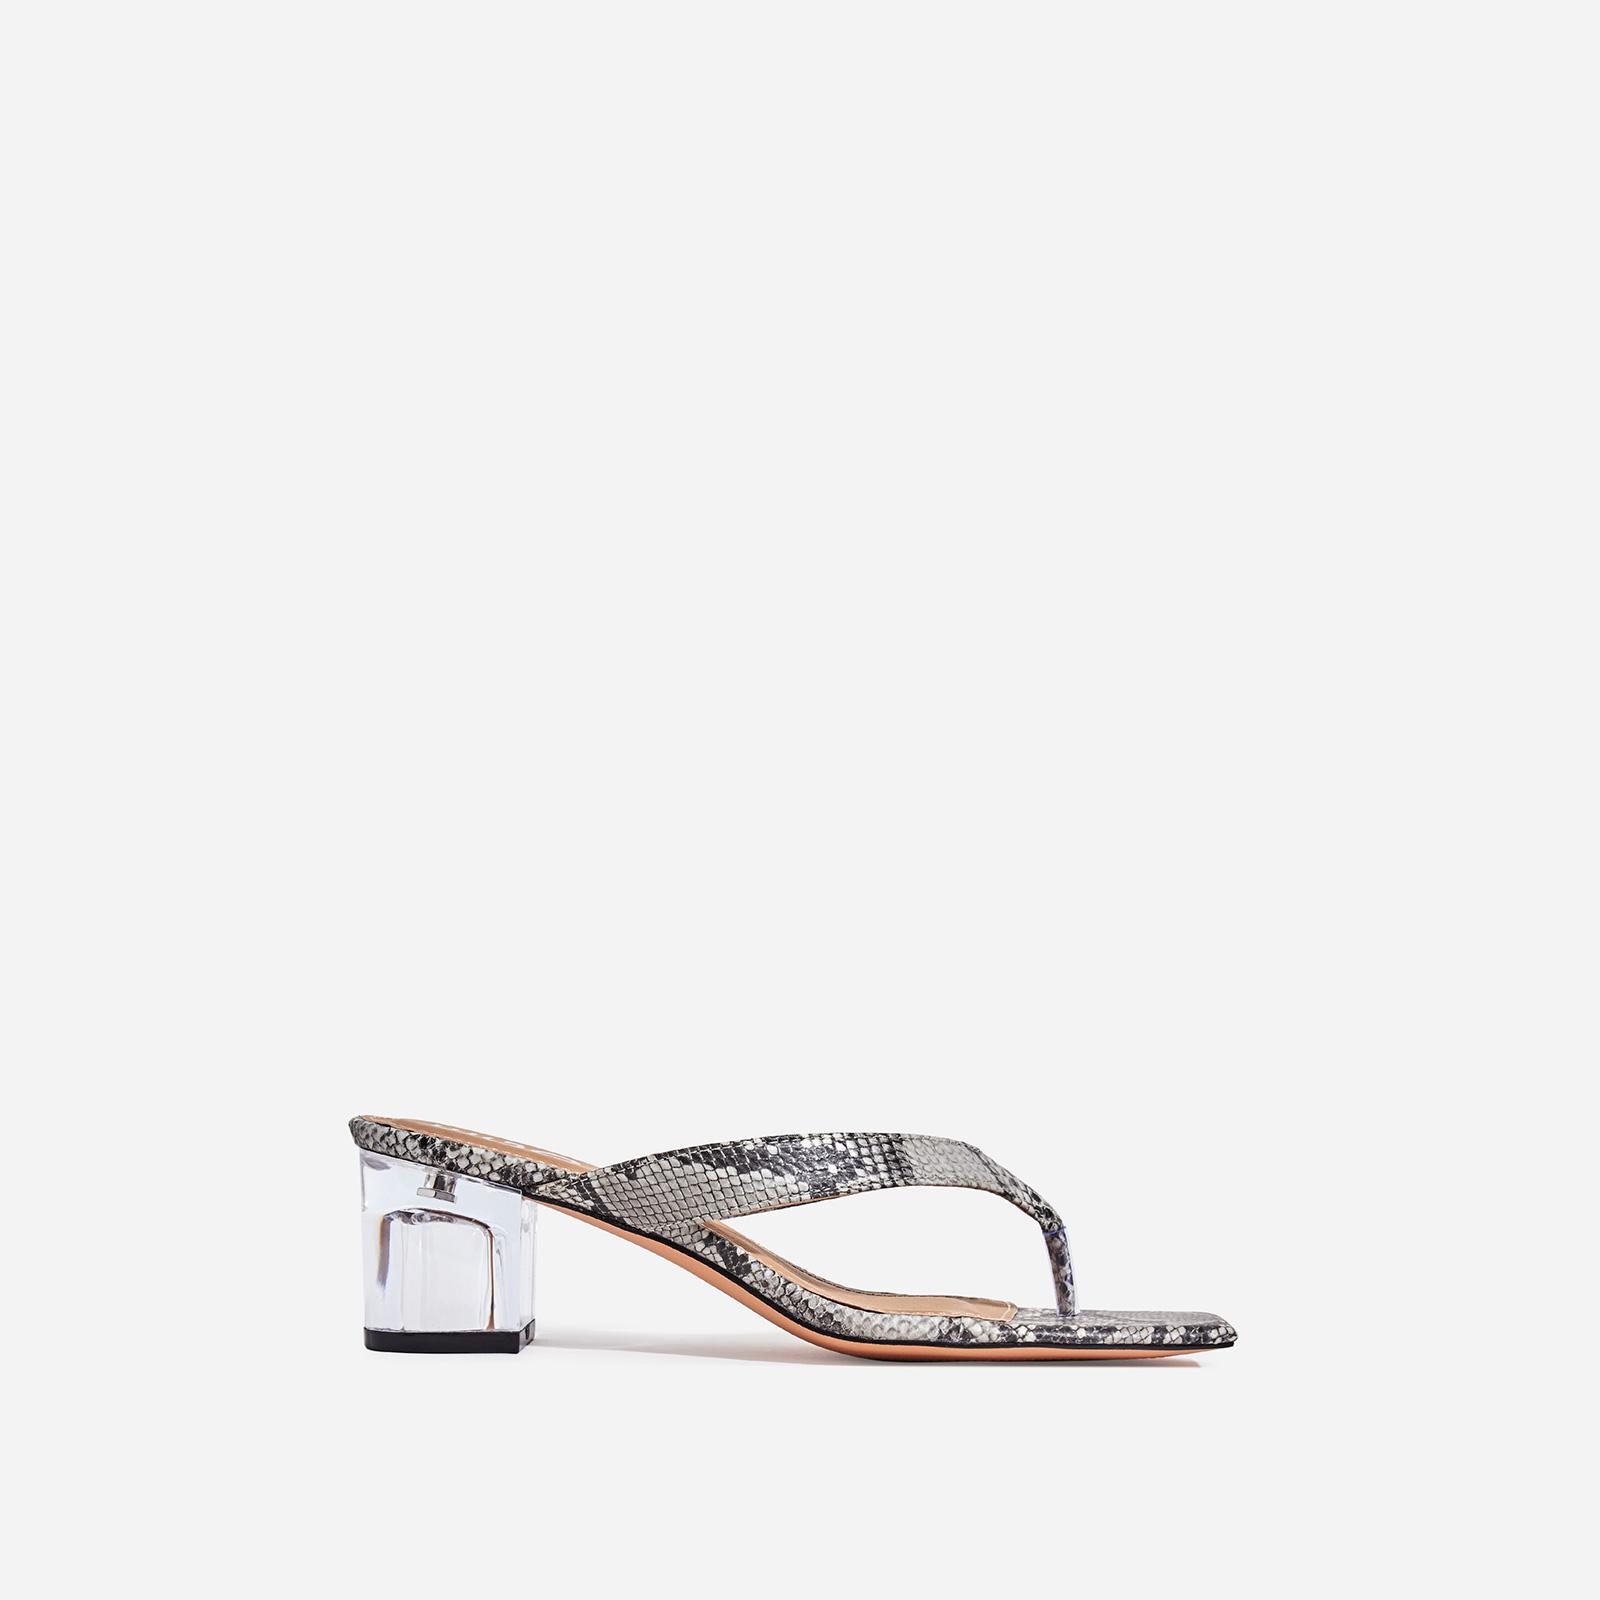 Emme Square Toe Clear Perspex Midi Block Heel Mule In Grey Snake Print Faux Leather